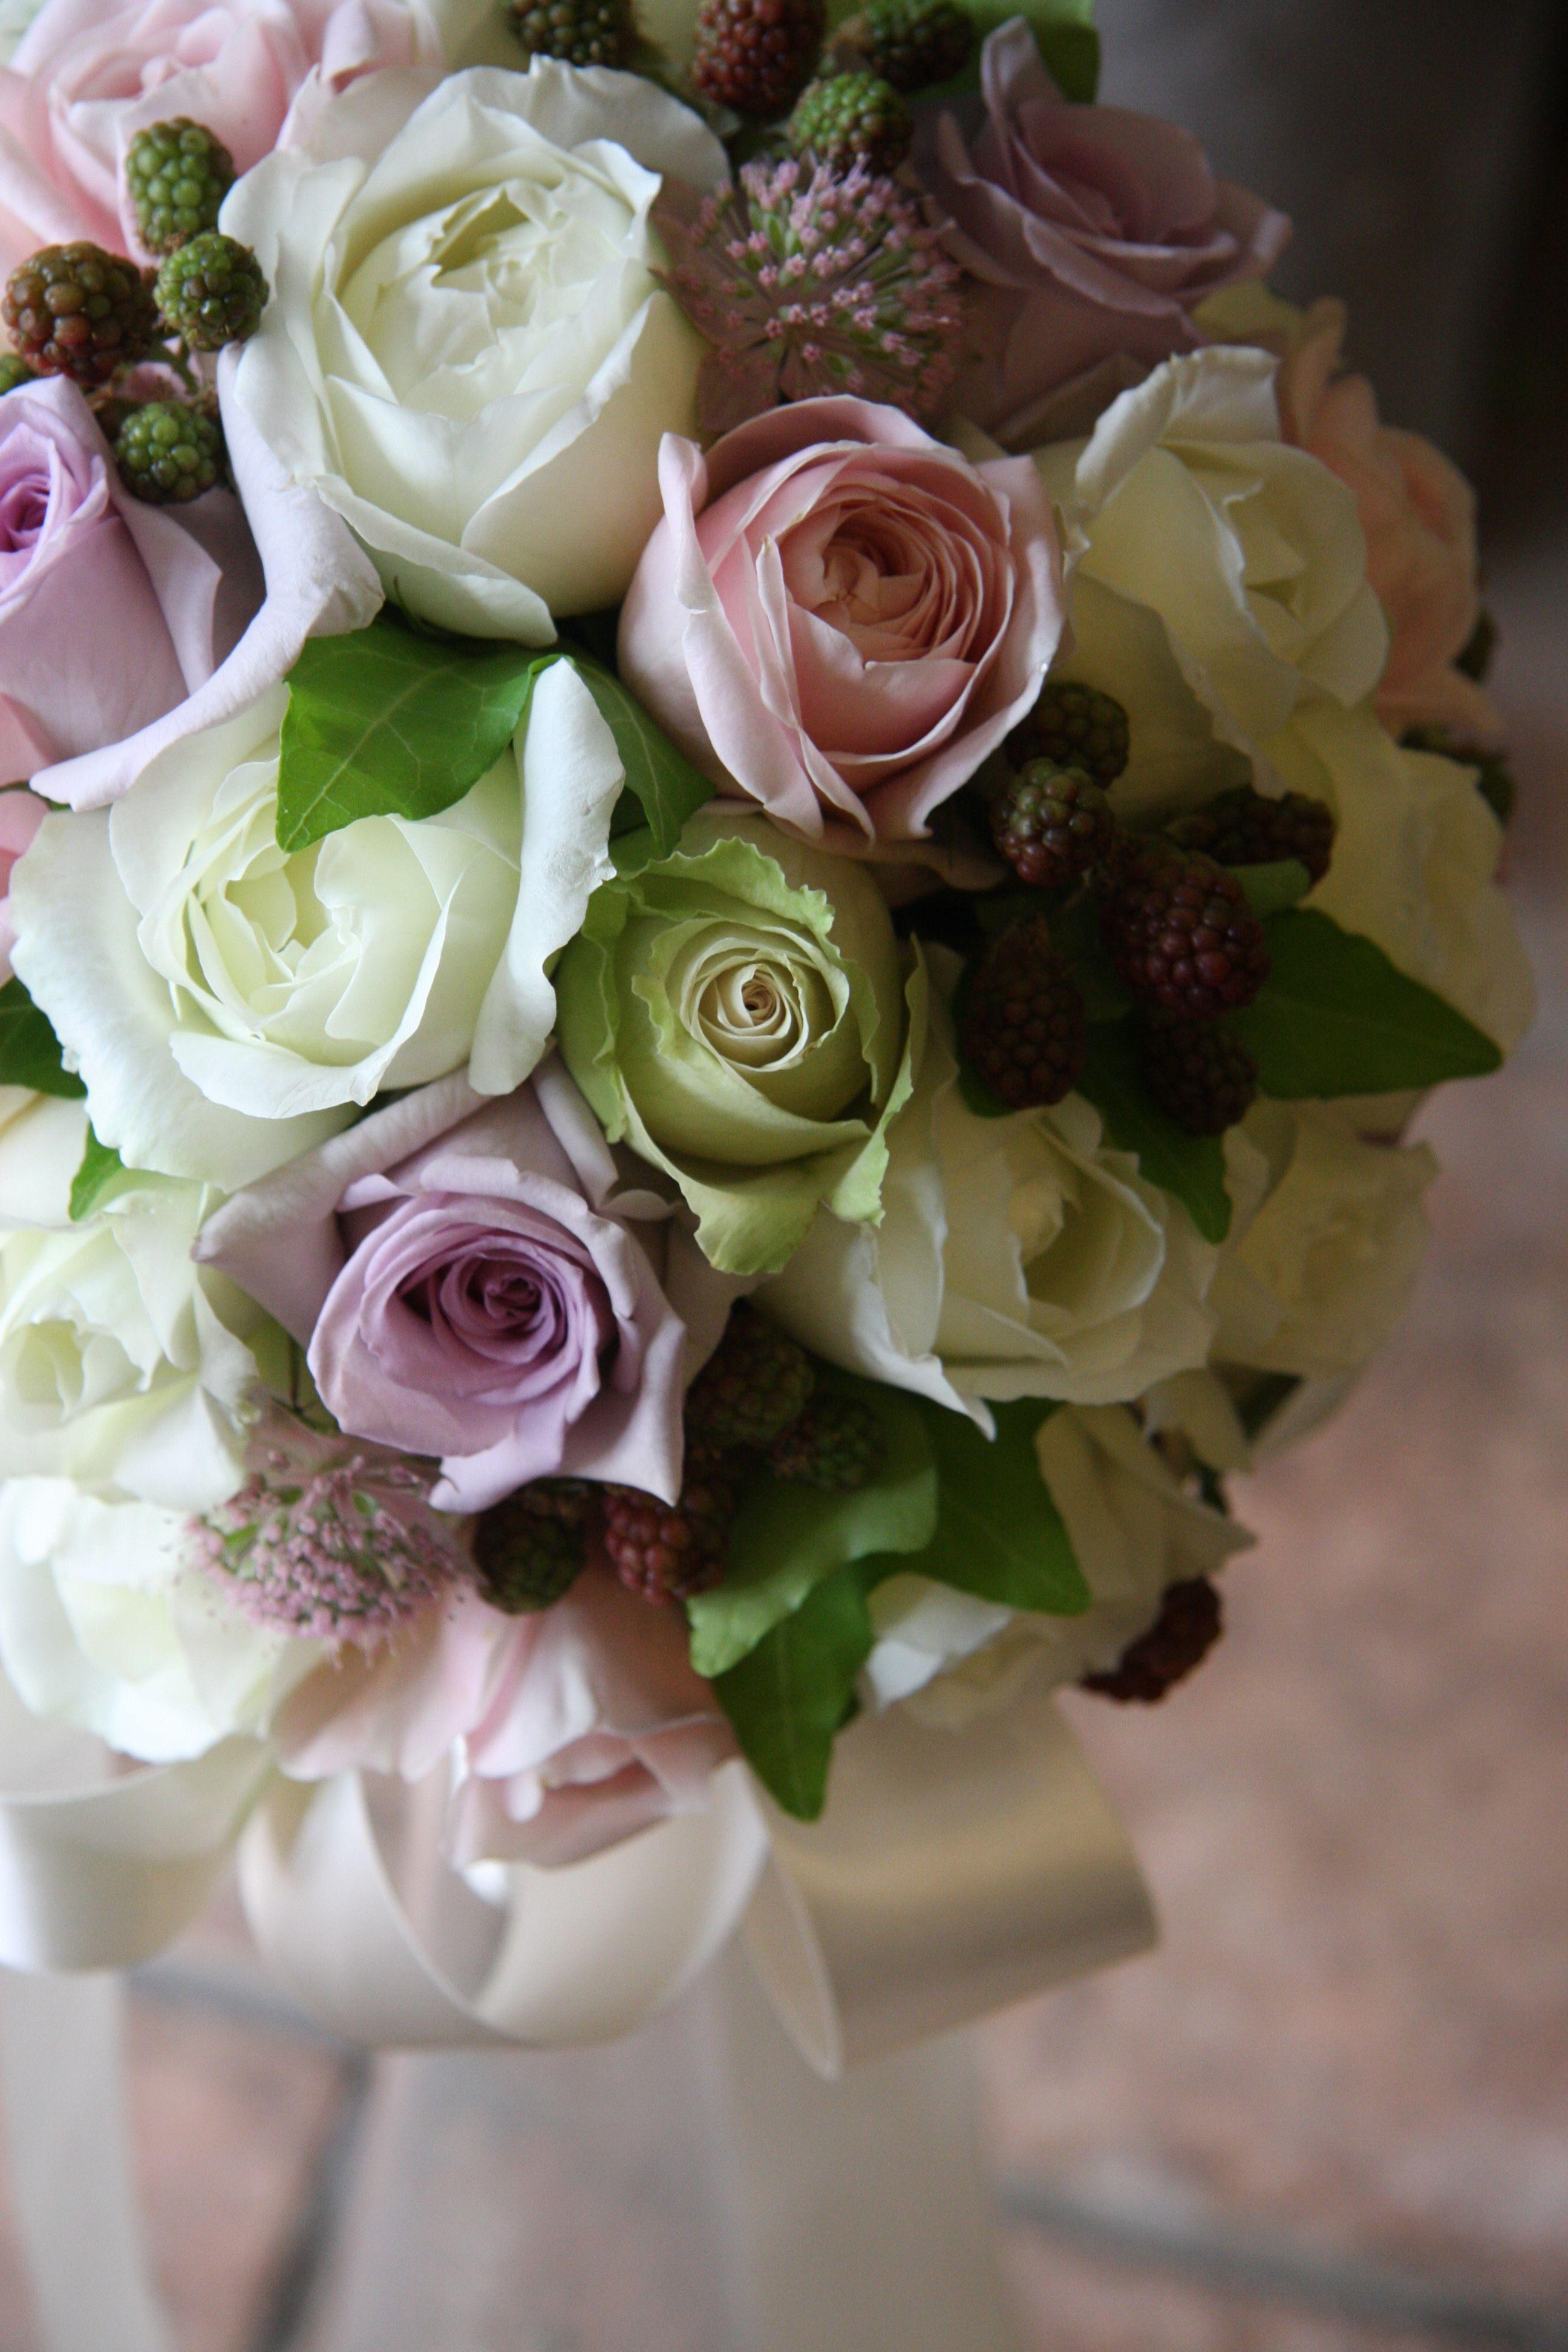 LOVE purple roses